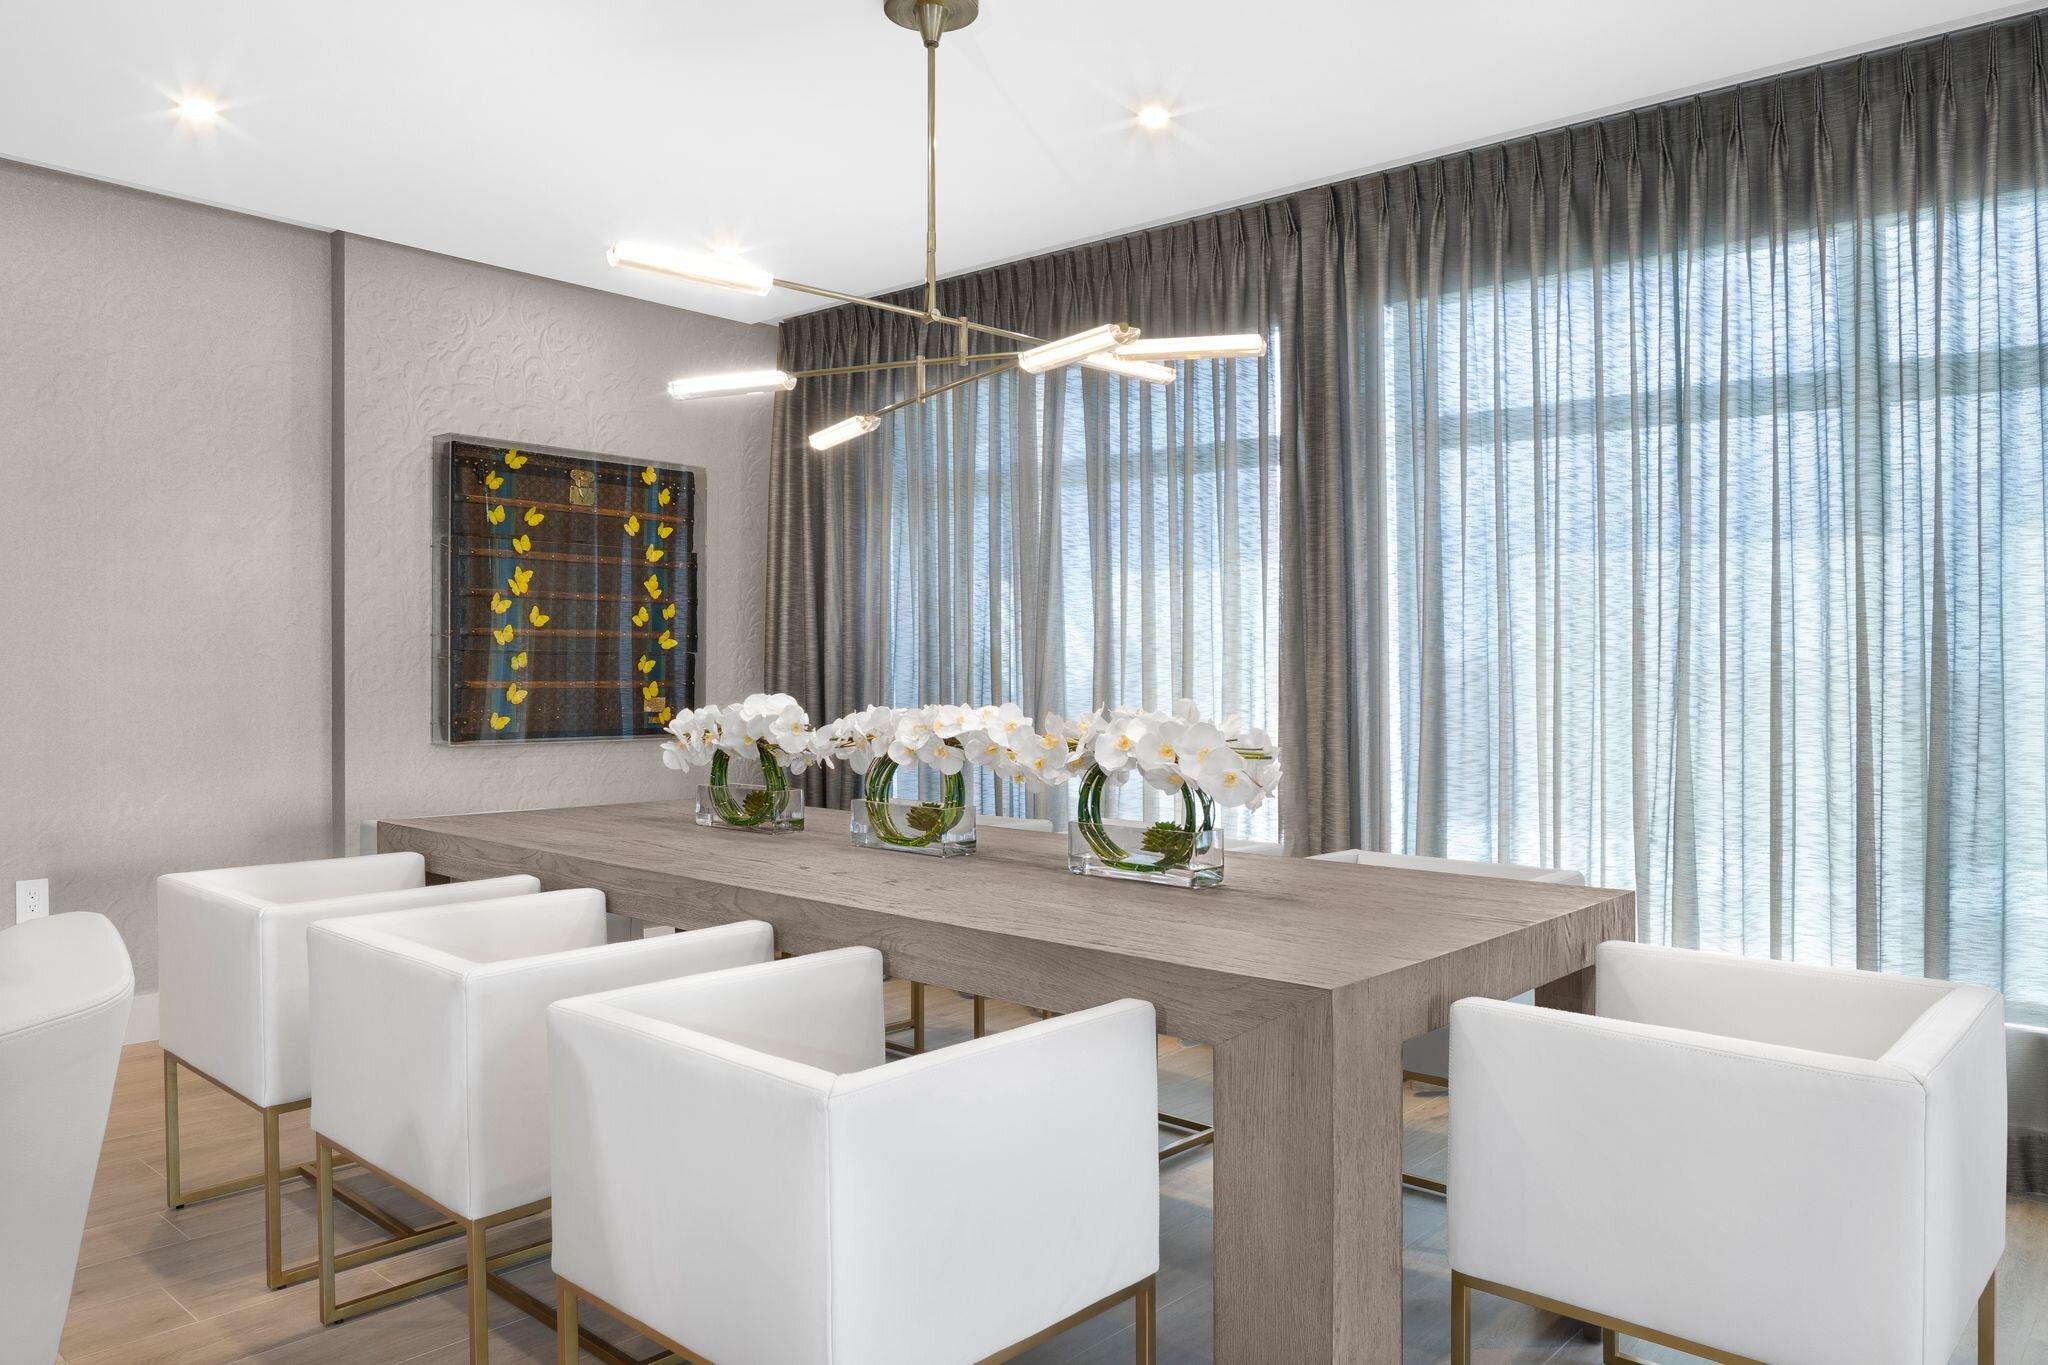 Boca Raton New York And Boston Turn Key Interior Design New Construction Renovations And Remodels